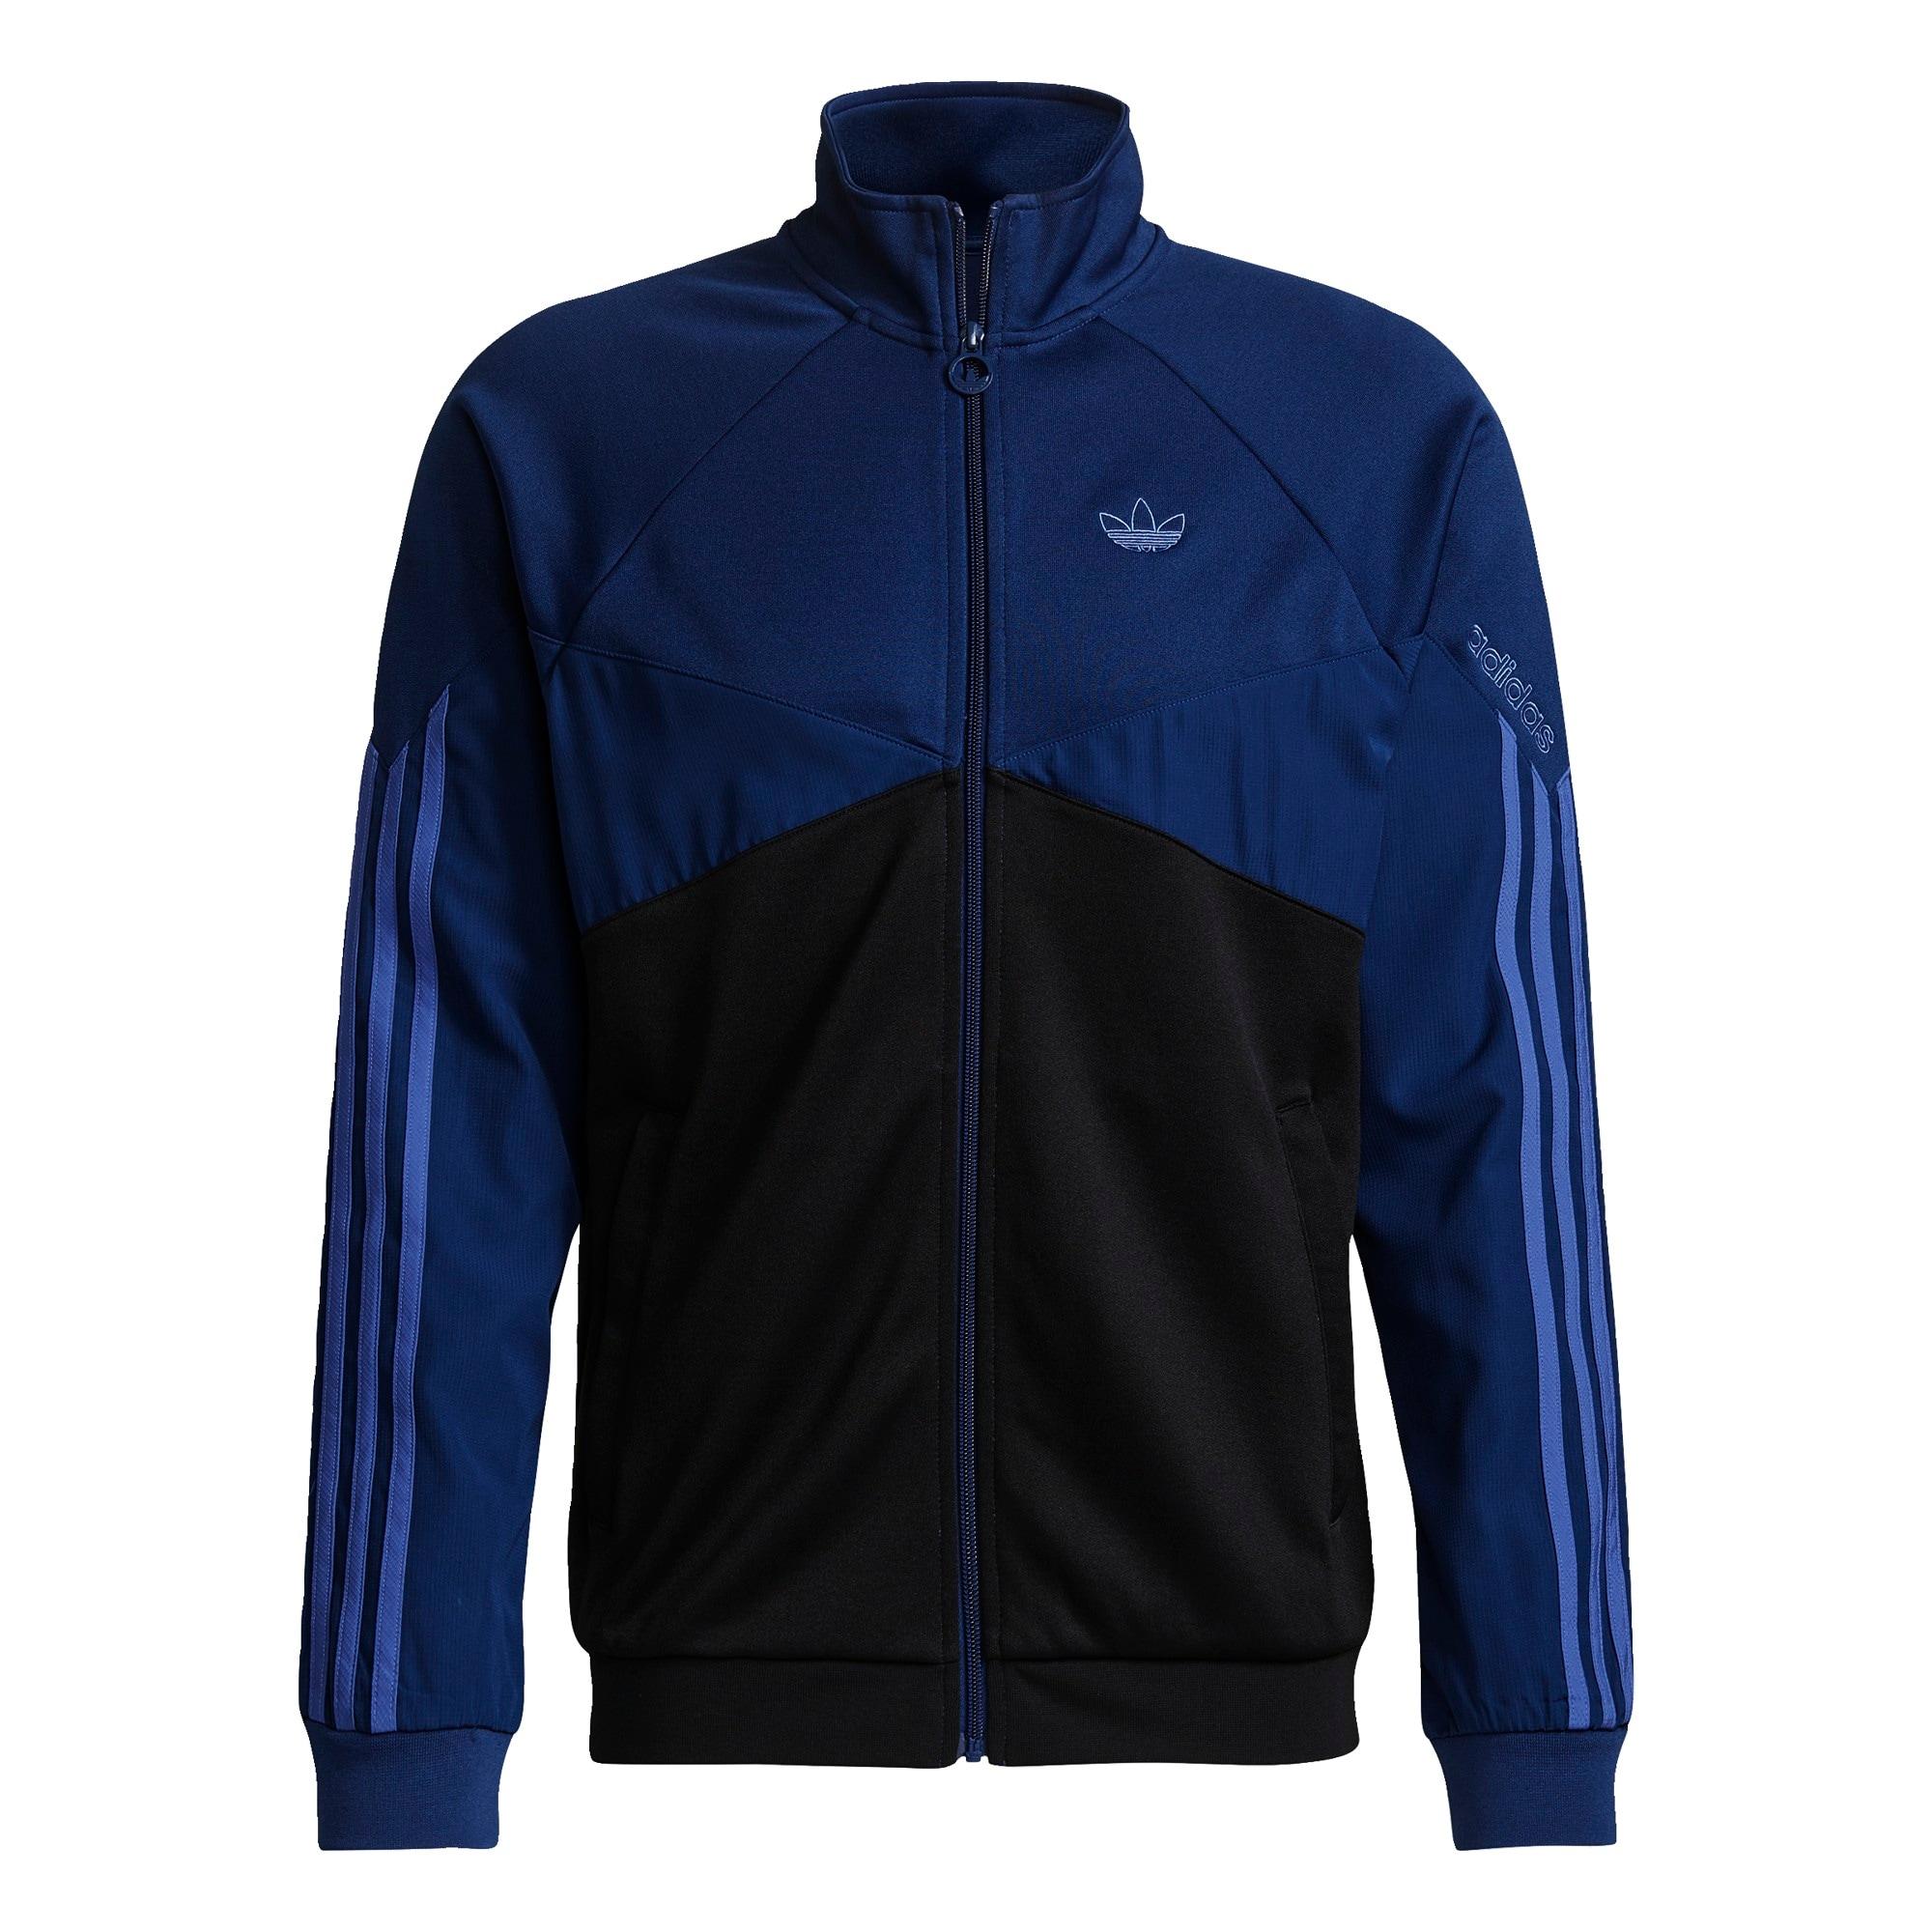 ADIDAS ORIGINALS Mikina s kapucí  tmavě modrá / černá / chladná modrá